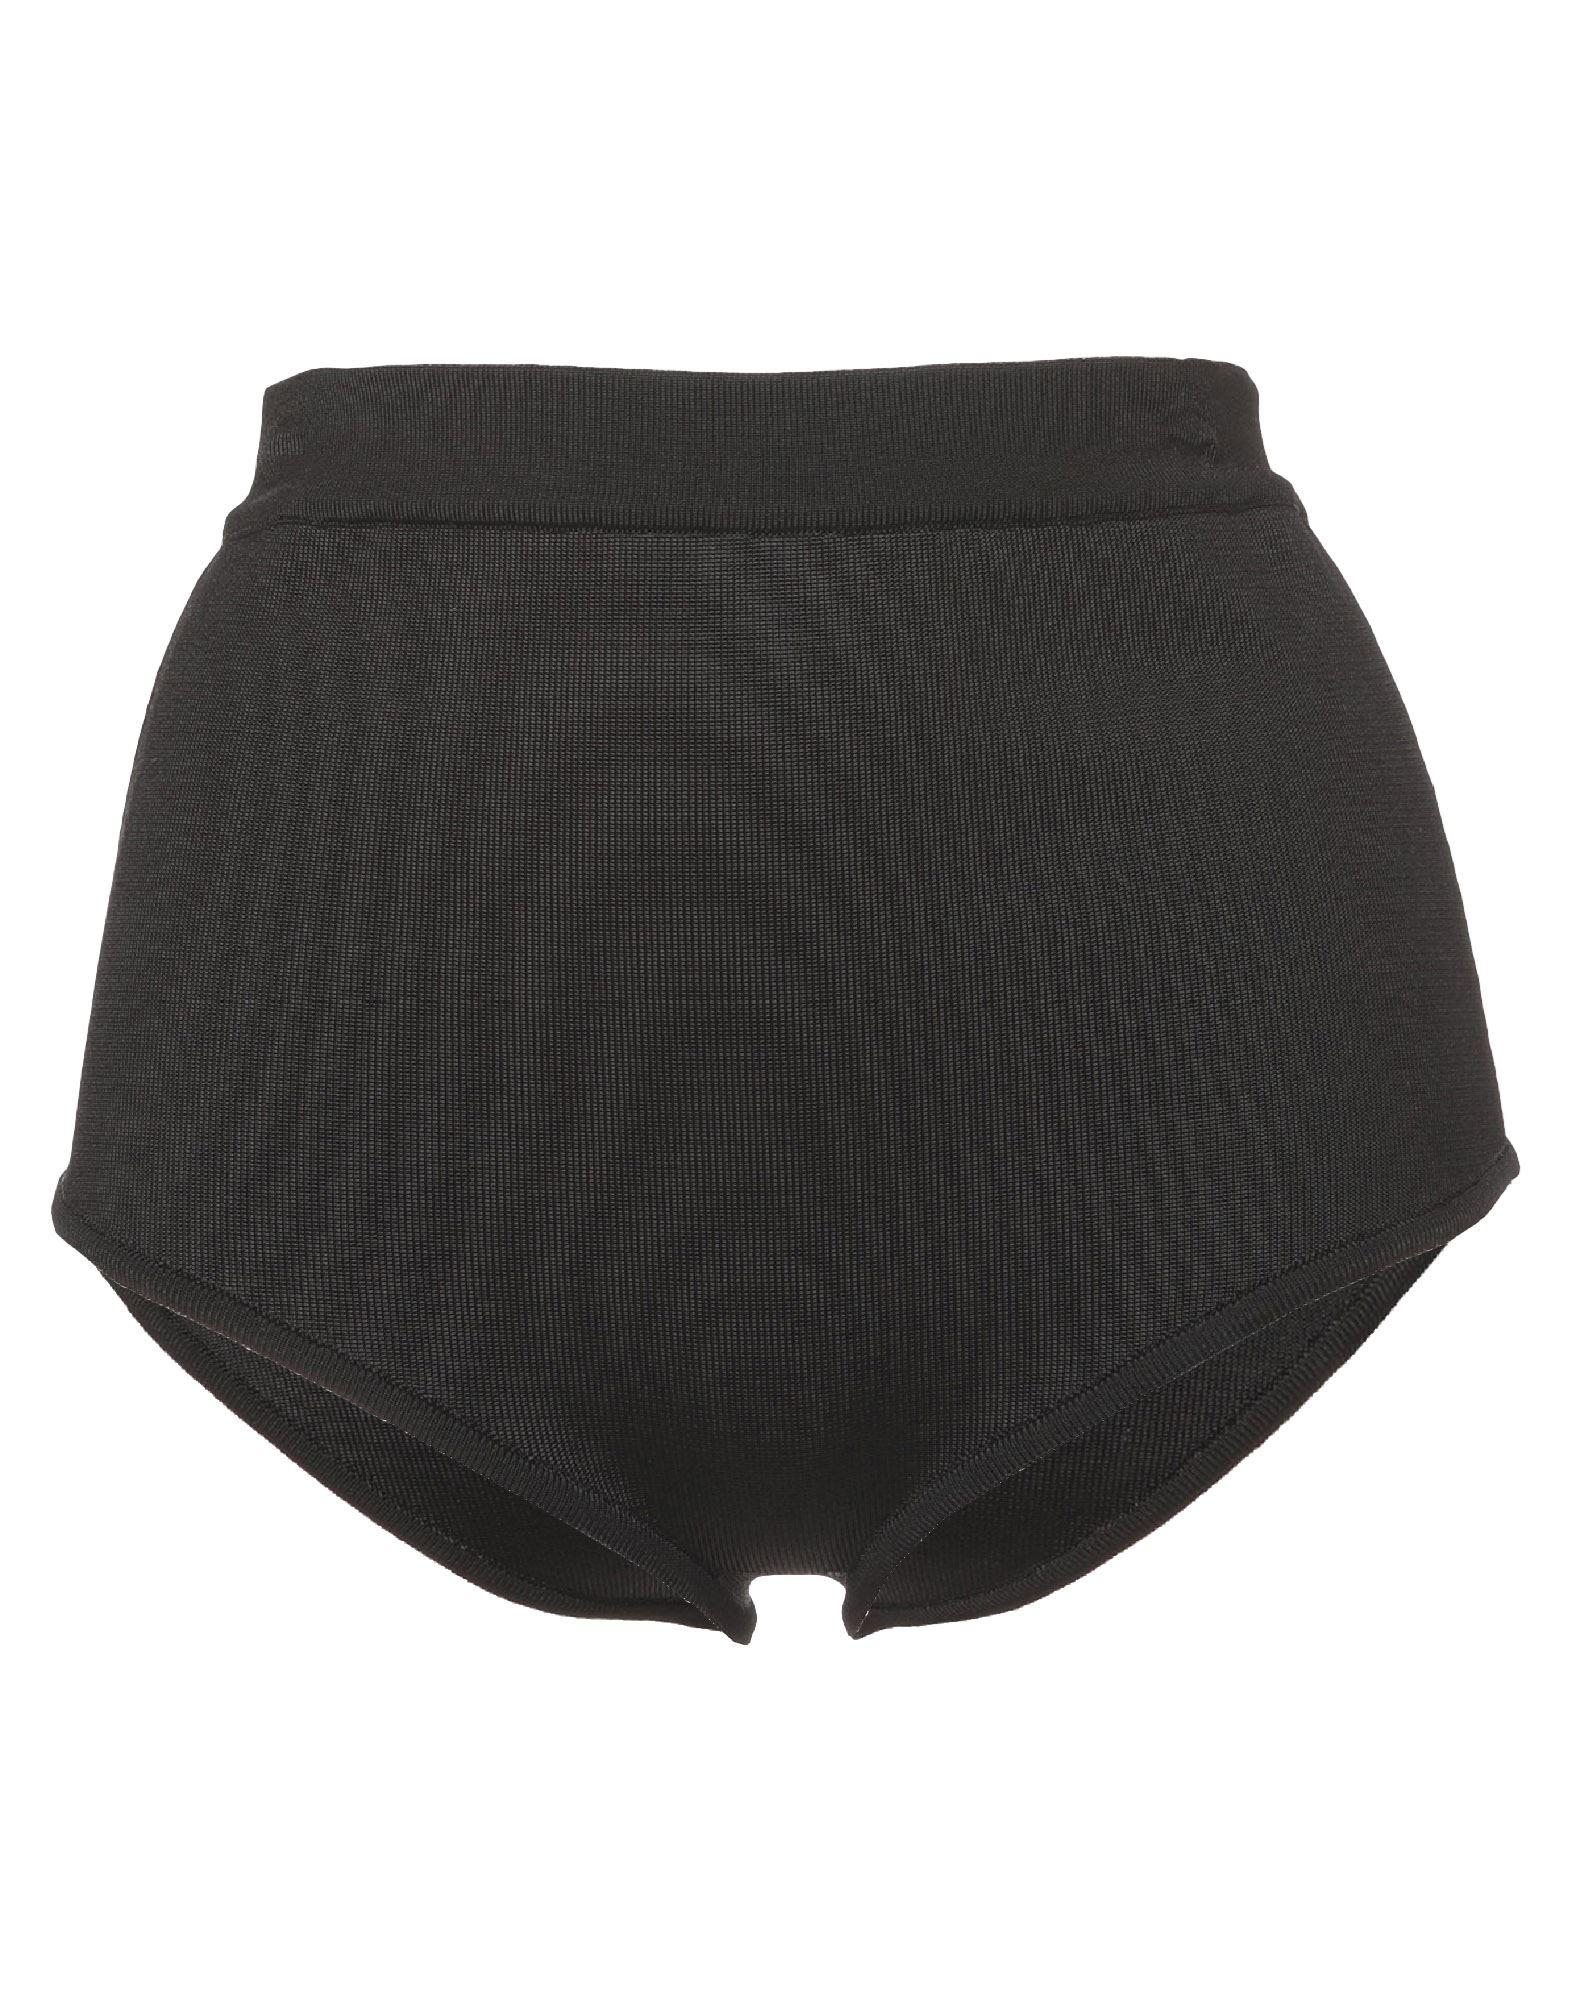 BALMAIN Boyshorts. jersey, no appliqués, basic solid color, no fastening, unlined. 90% Viscose, 9% Polyamide, 1% Elastane